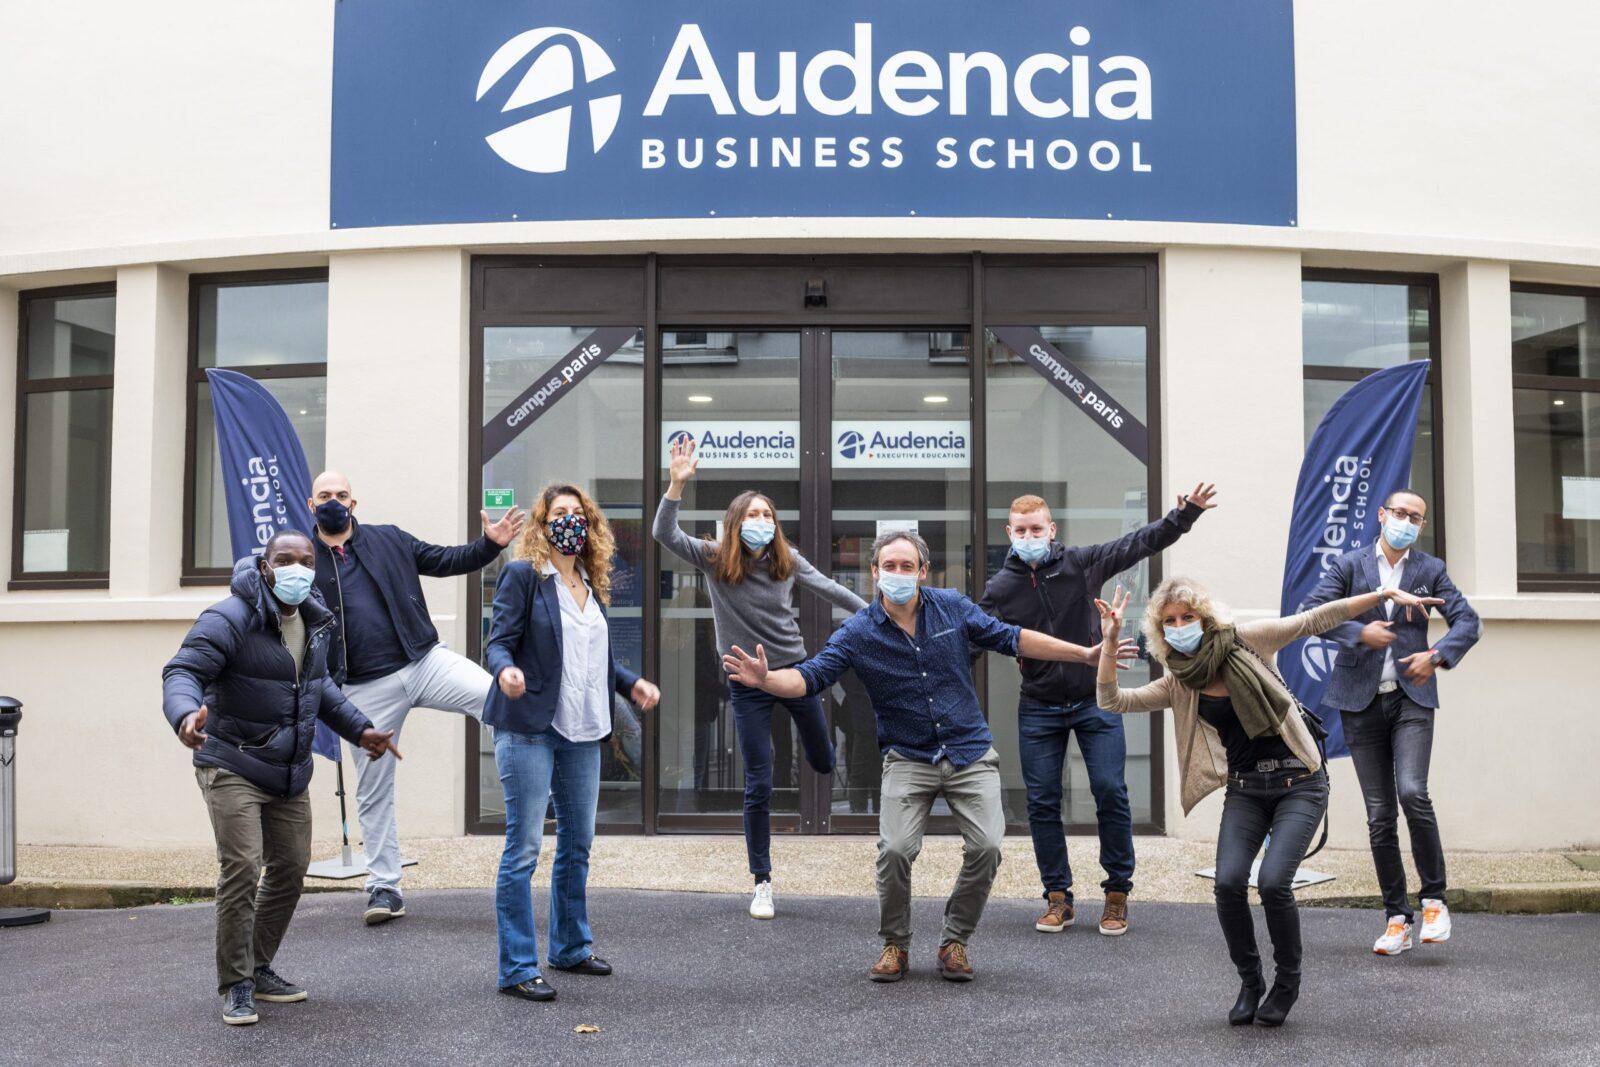 Reportage Audencia Business School Photographe Caroline Bleux